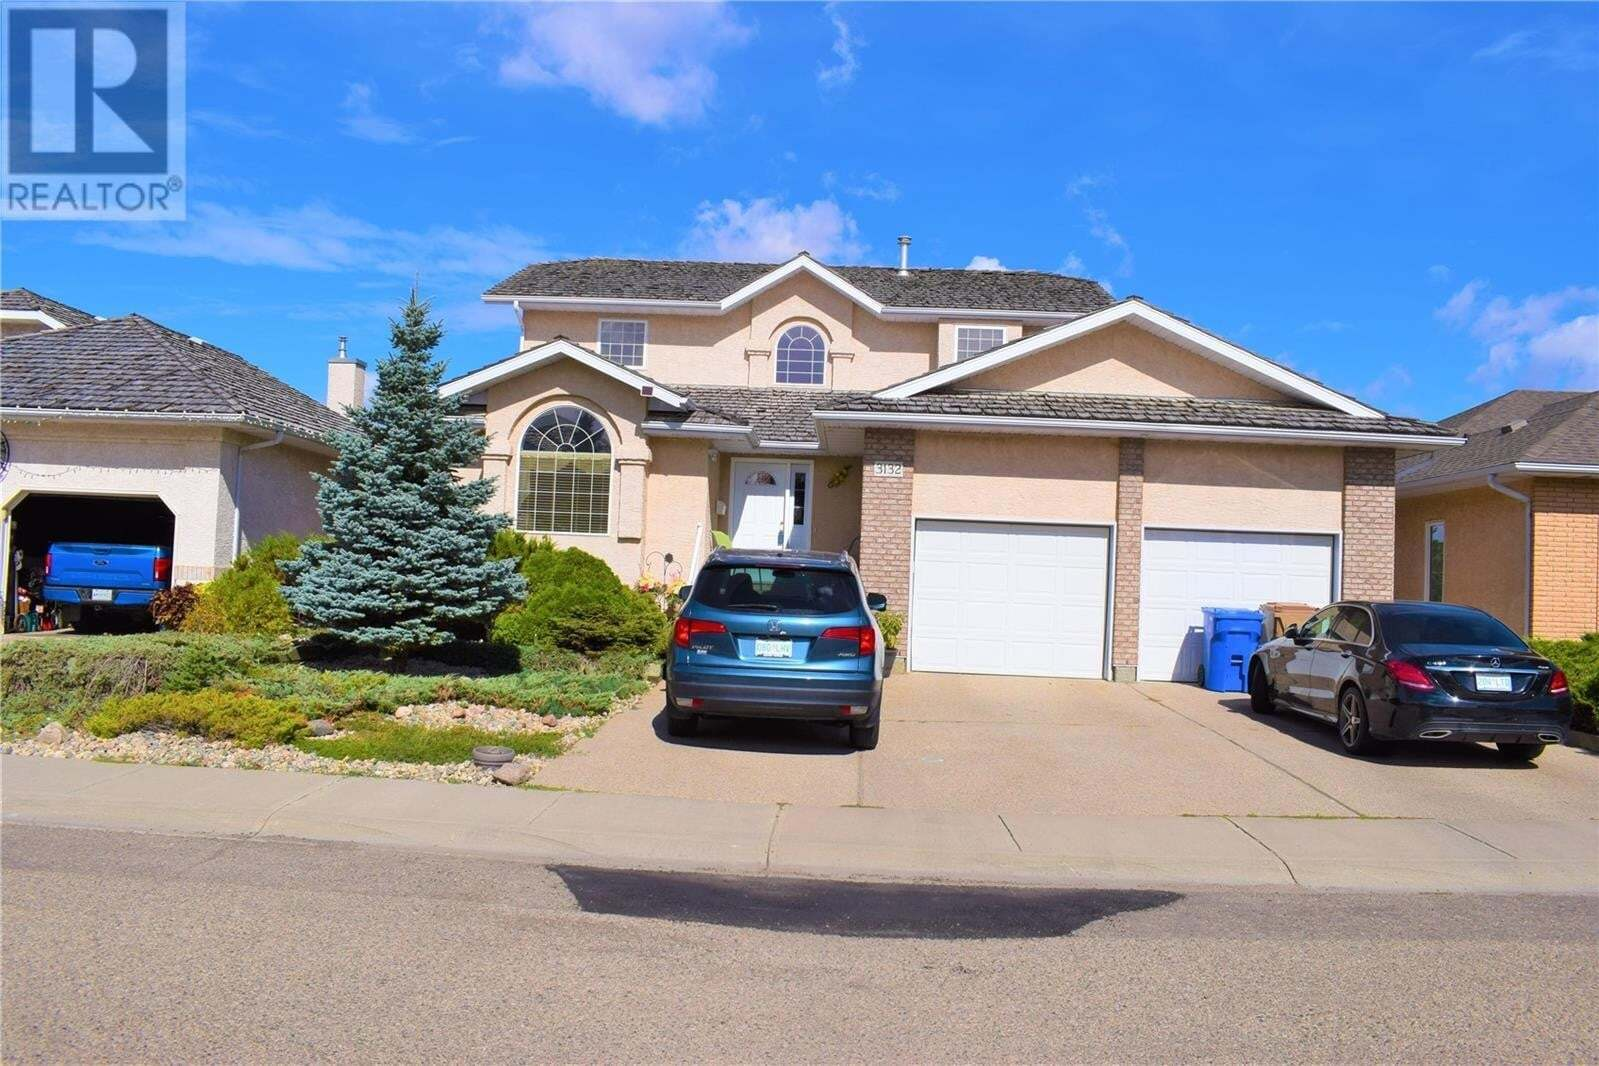 House for sale at 3132 Winchester Rd Regina Saskatchewan - MLS: SK826109